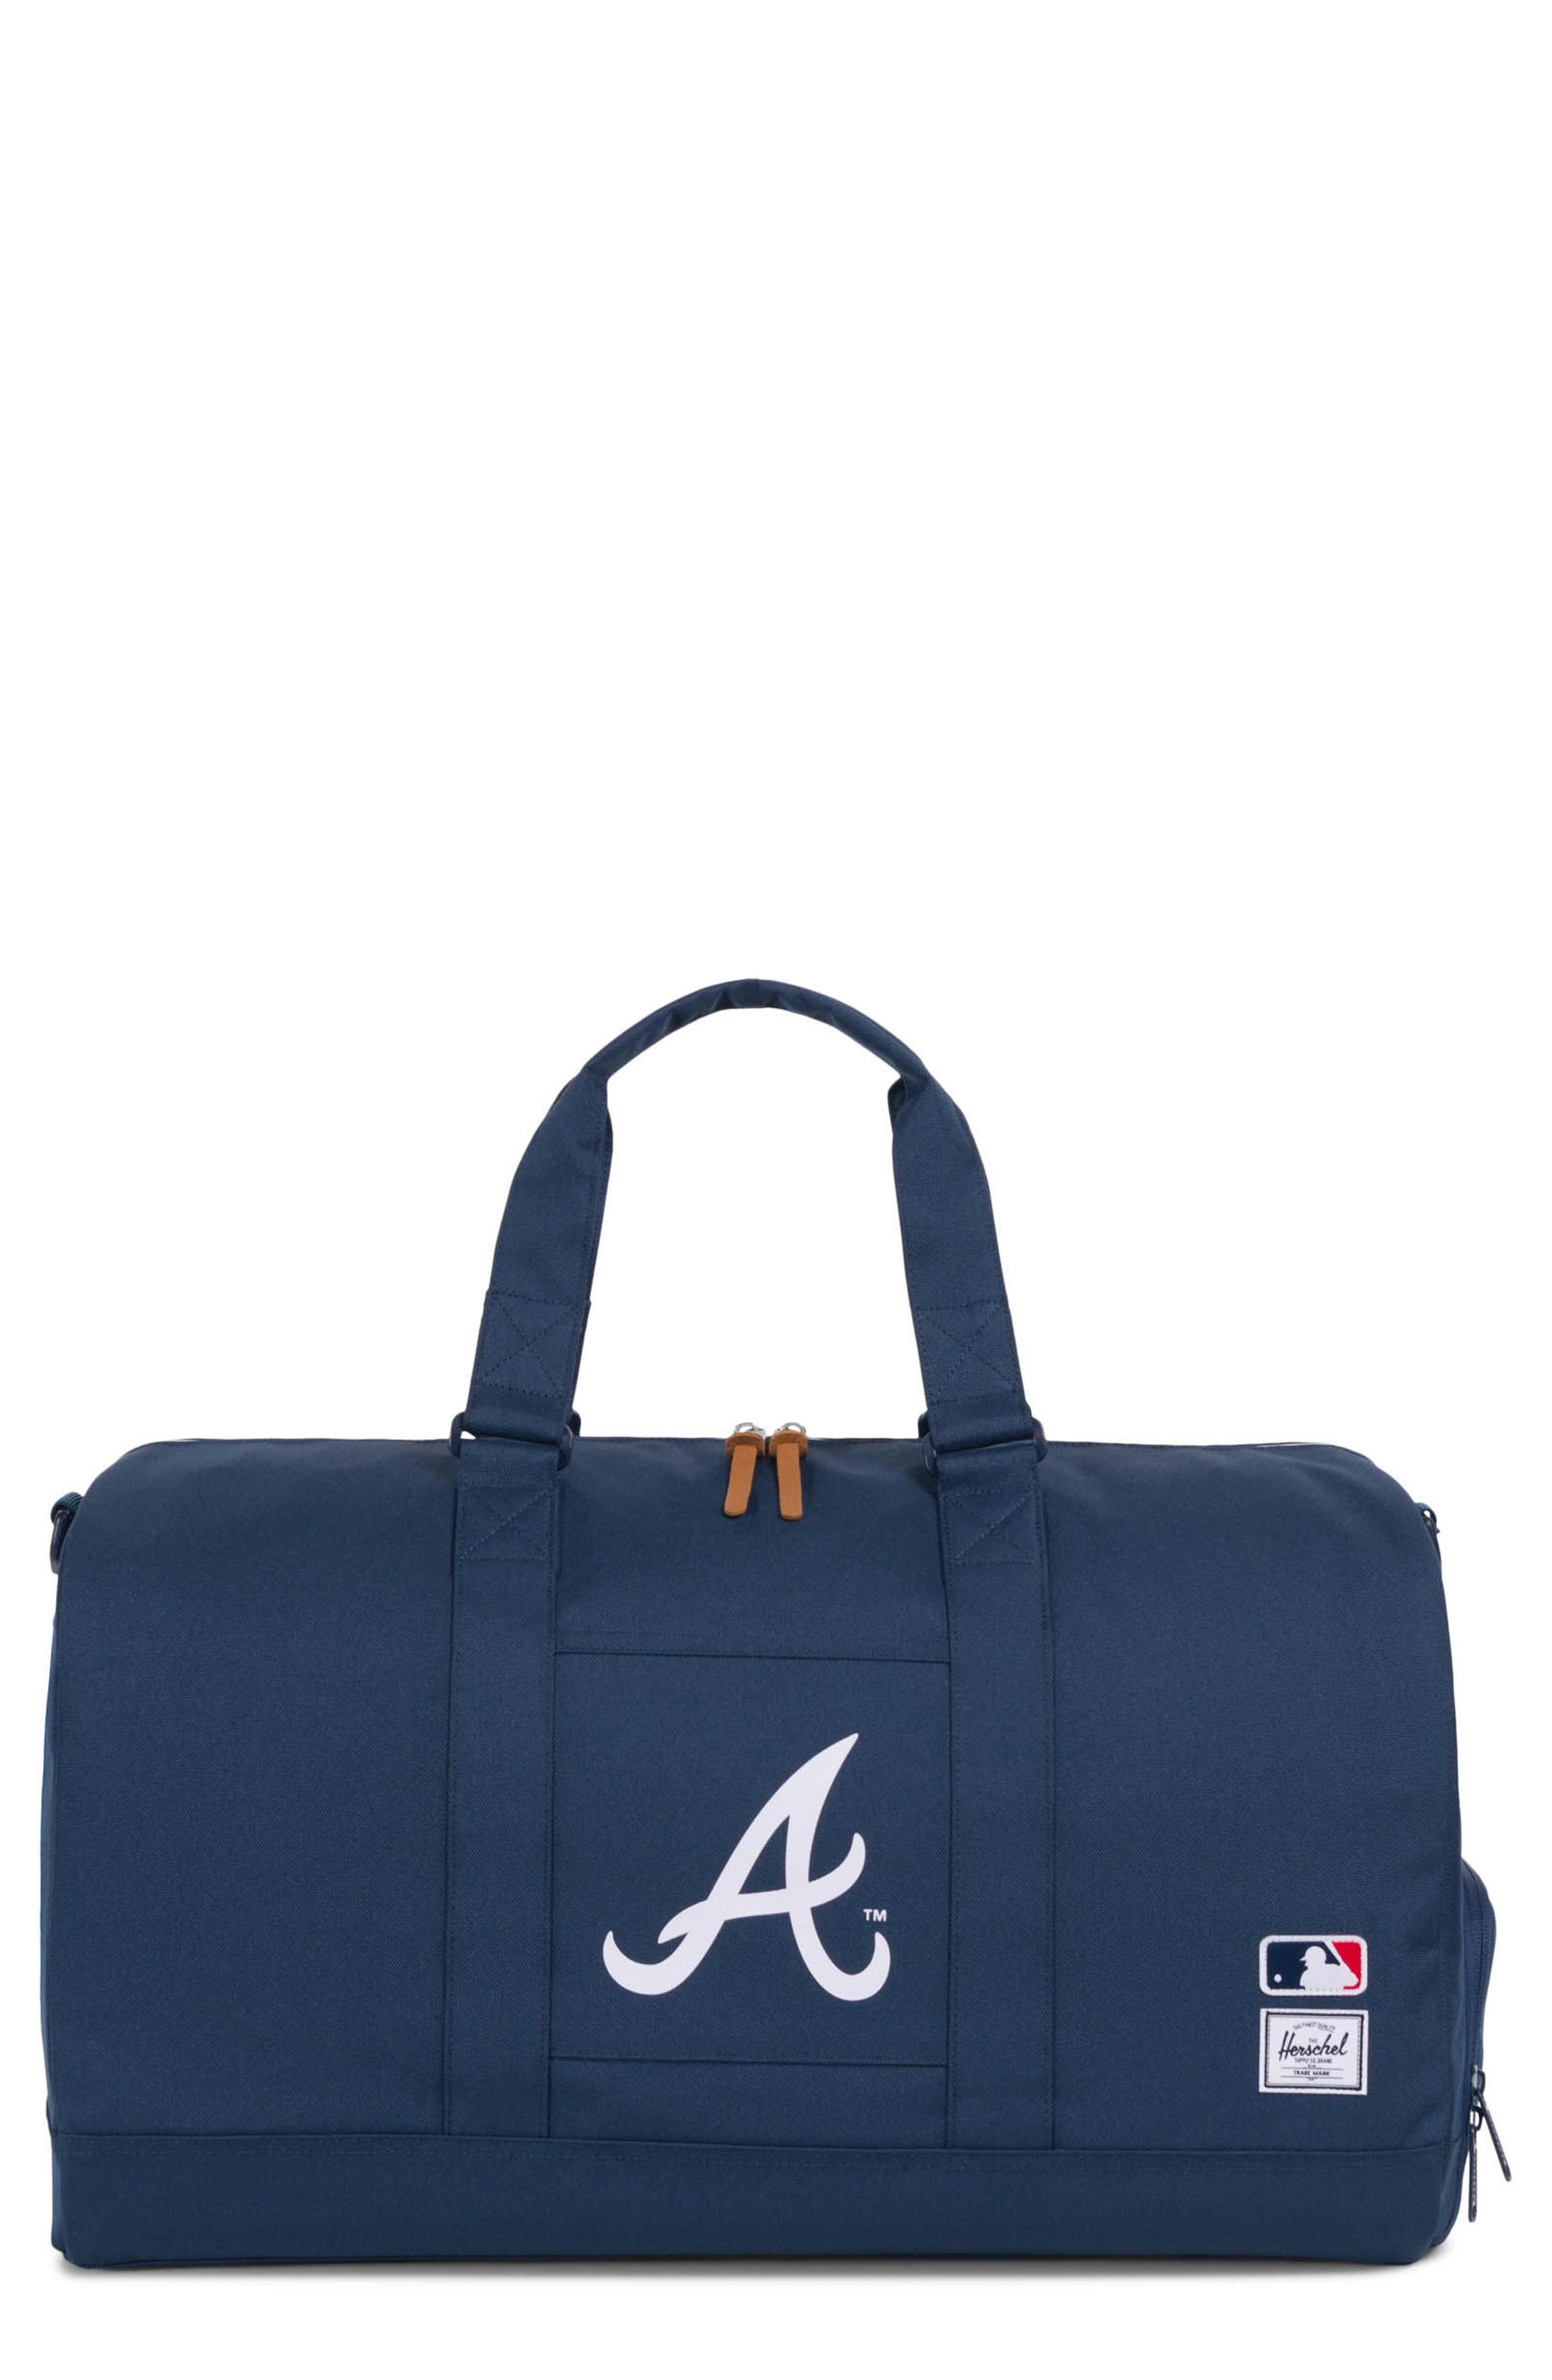 44d63062f9 Herschel Supply Co. Novel - Mlb National League Duffel Bag - Blue In  Atlanta Braves